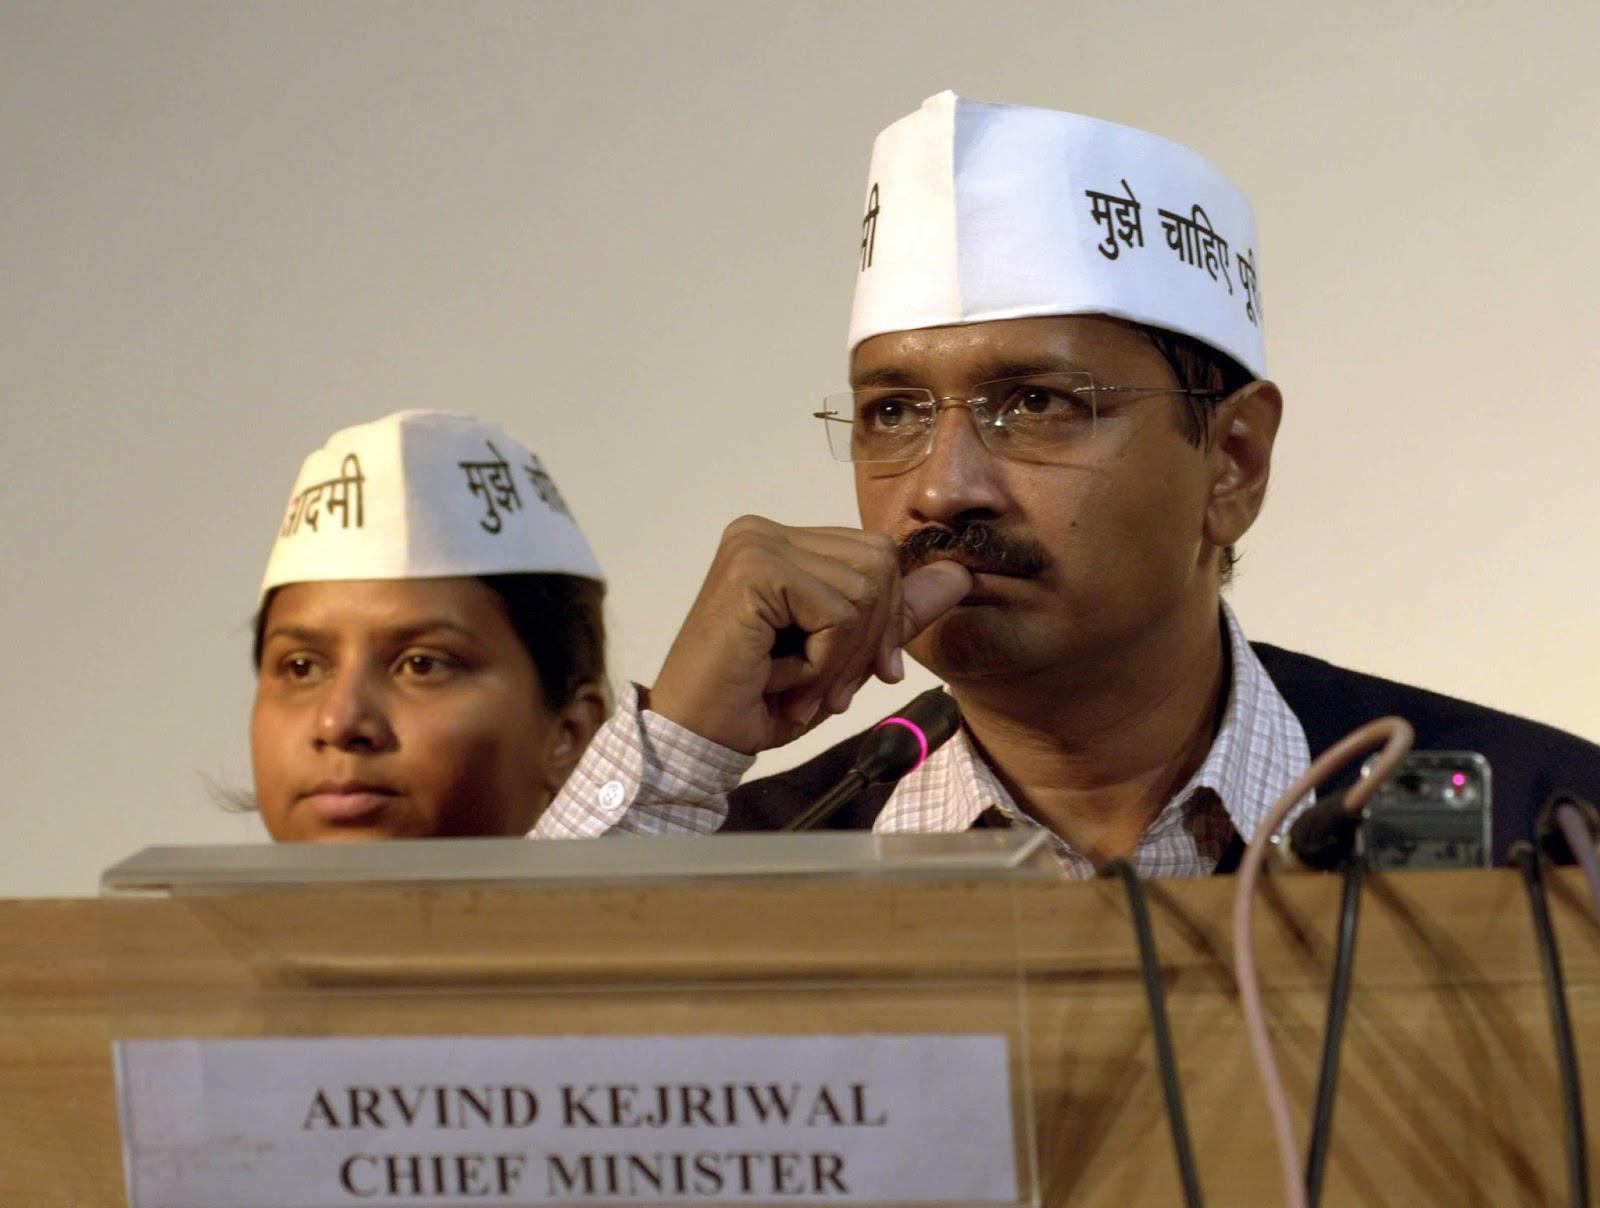 Arvind kejriwal speech wallpaper